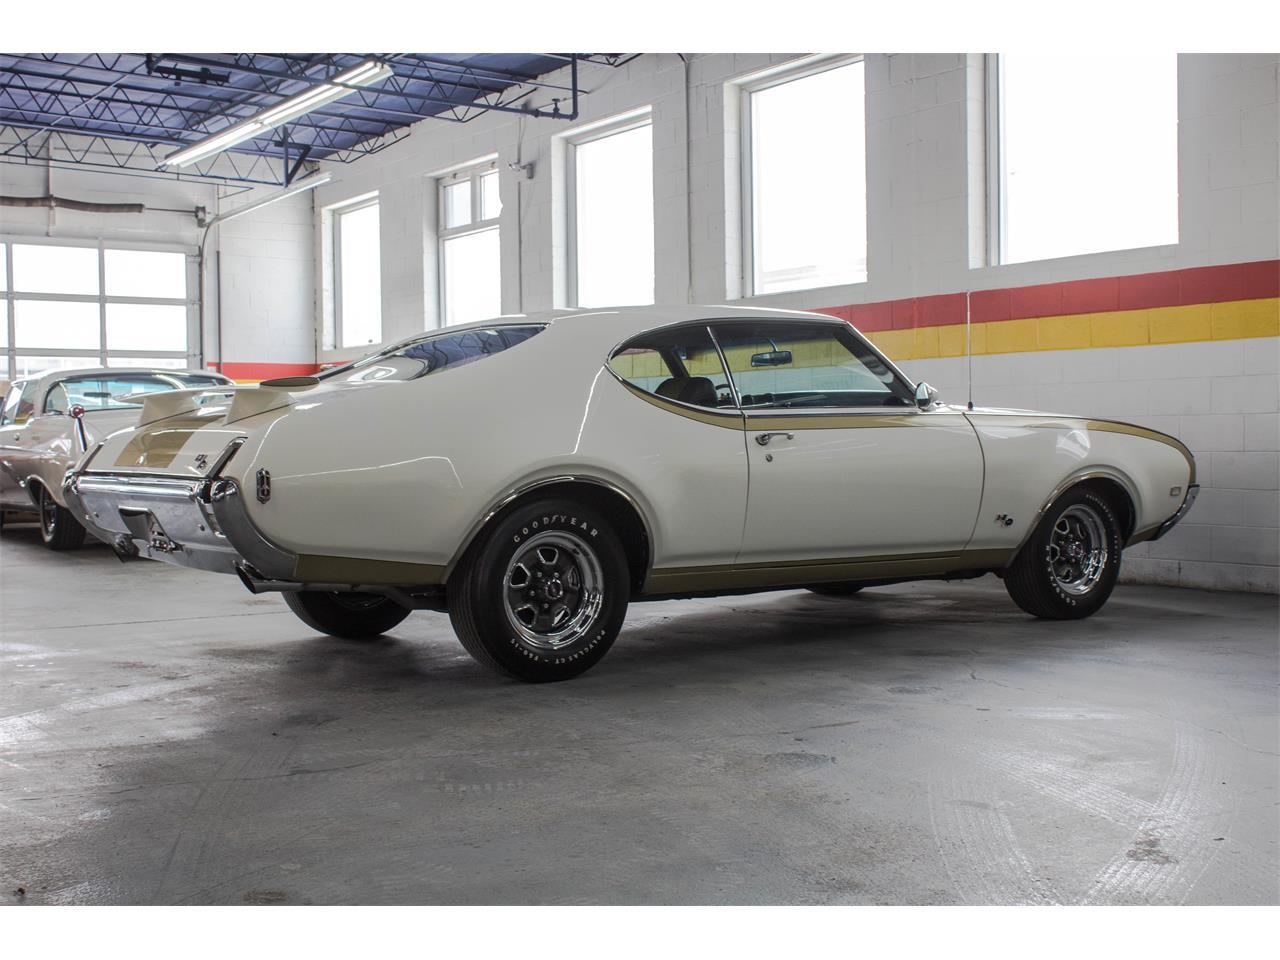 Large Picture of 1969 Hurst located in Quebec - $89,995.00 - GA07